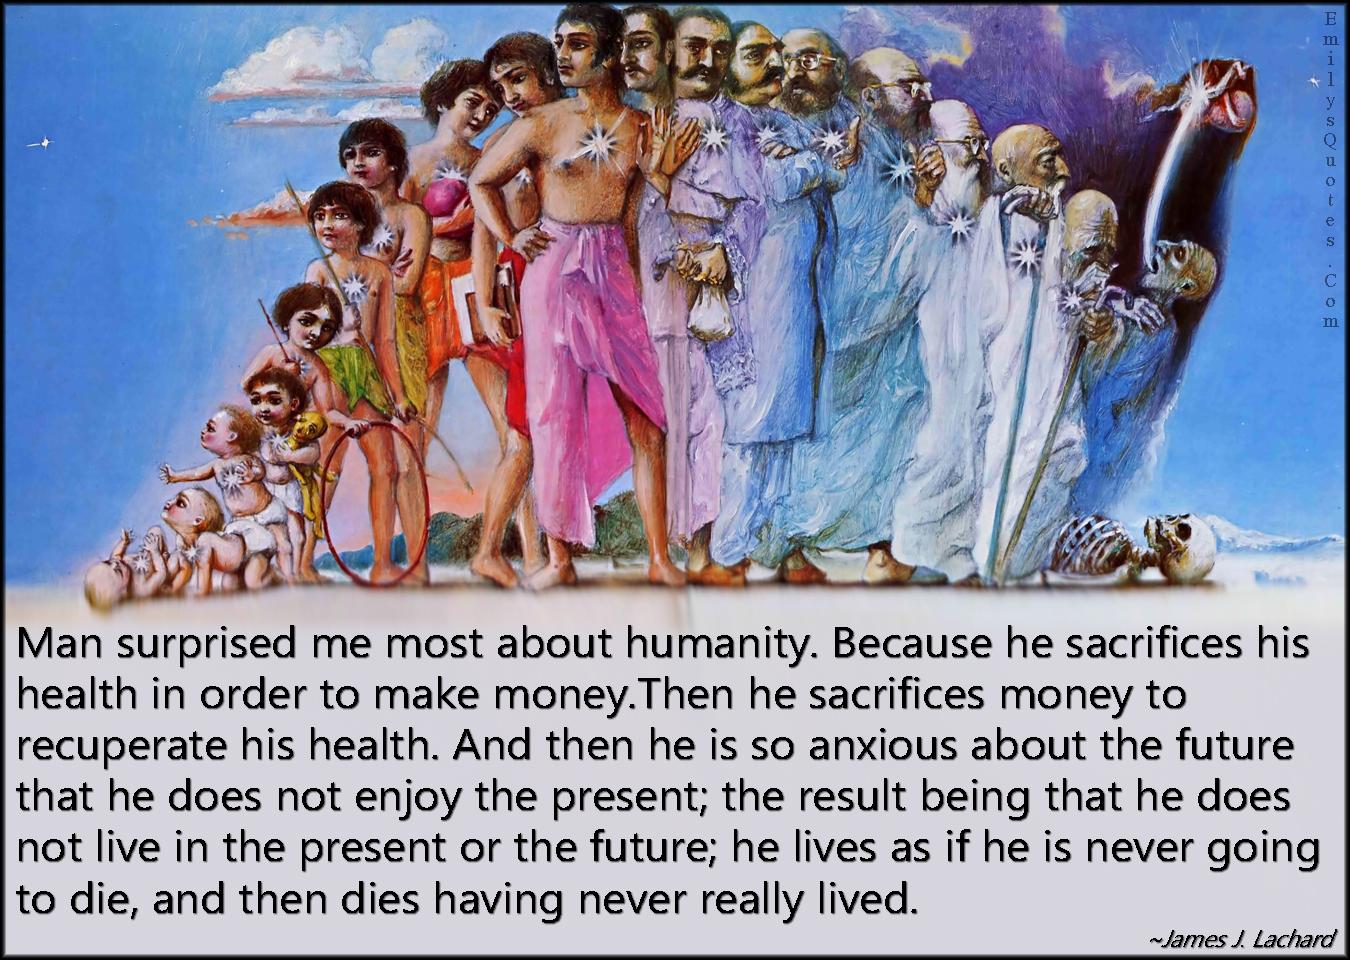 EmilysQuotes.Com - man, humanity, people, surprised, sacrifice, health, money, life, death, future, present, sad, mistake, wisdom, James J. Lachard